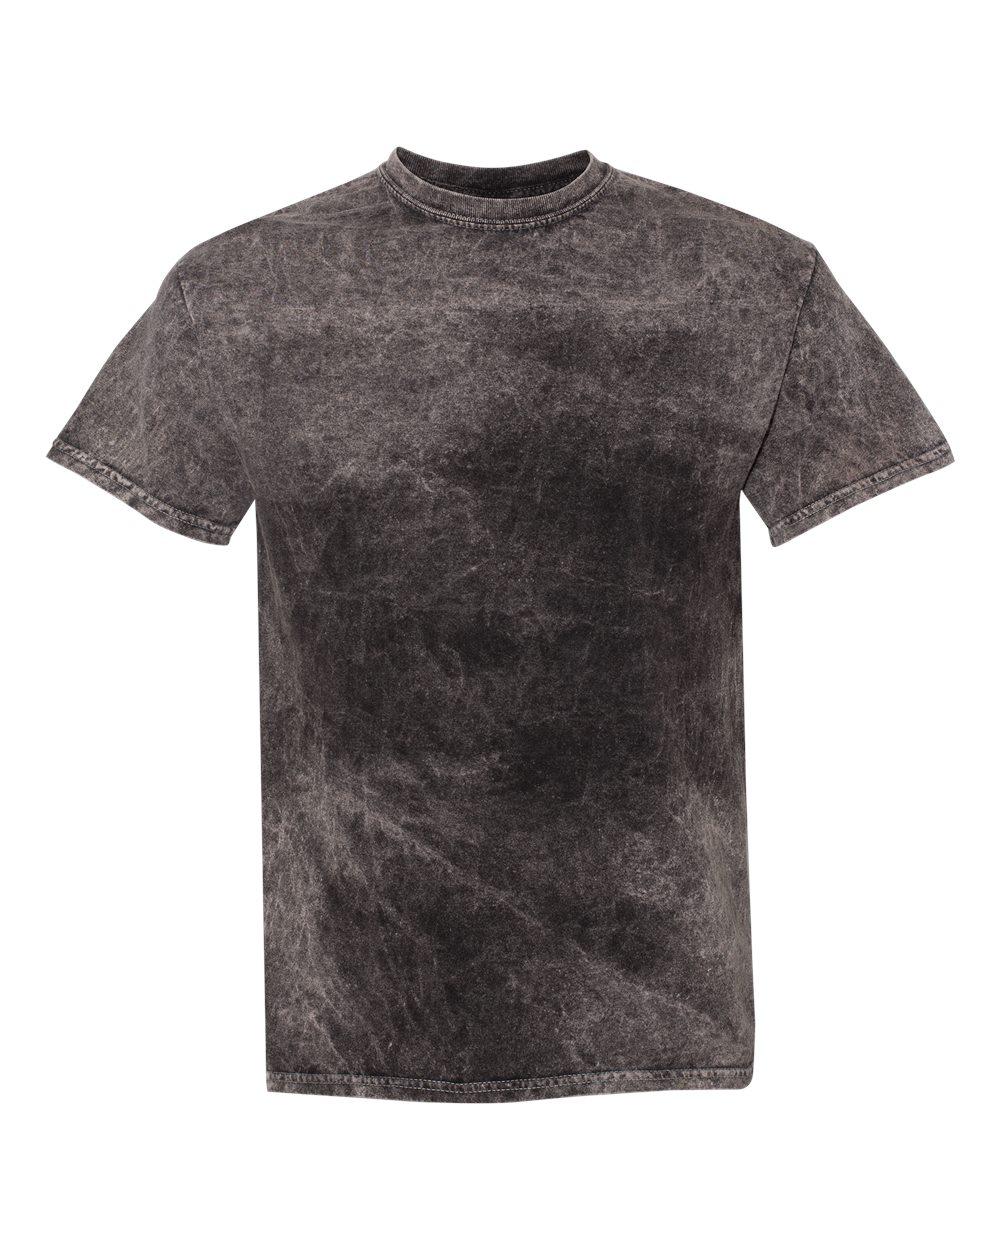 Dyenomite 200MW - Mineral Wash T-Shirt